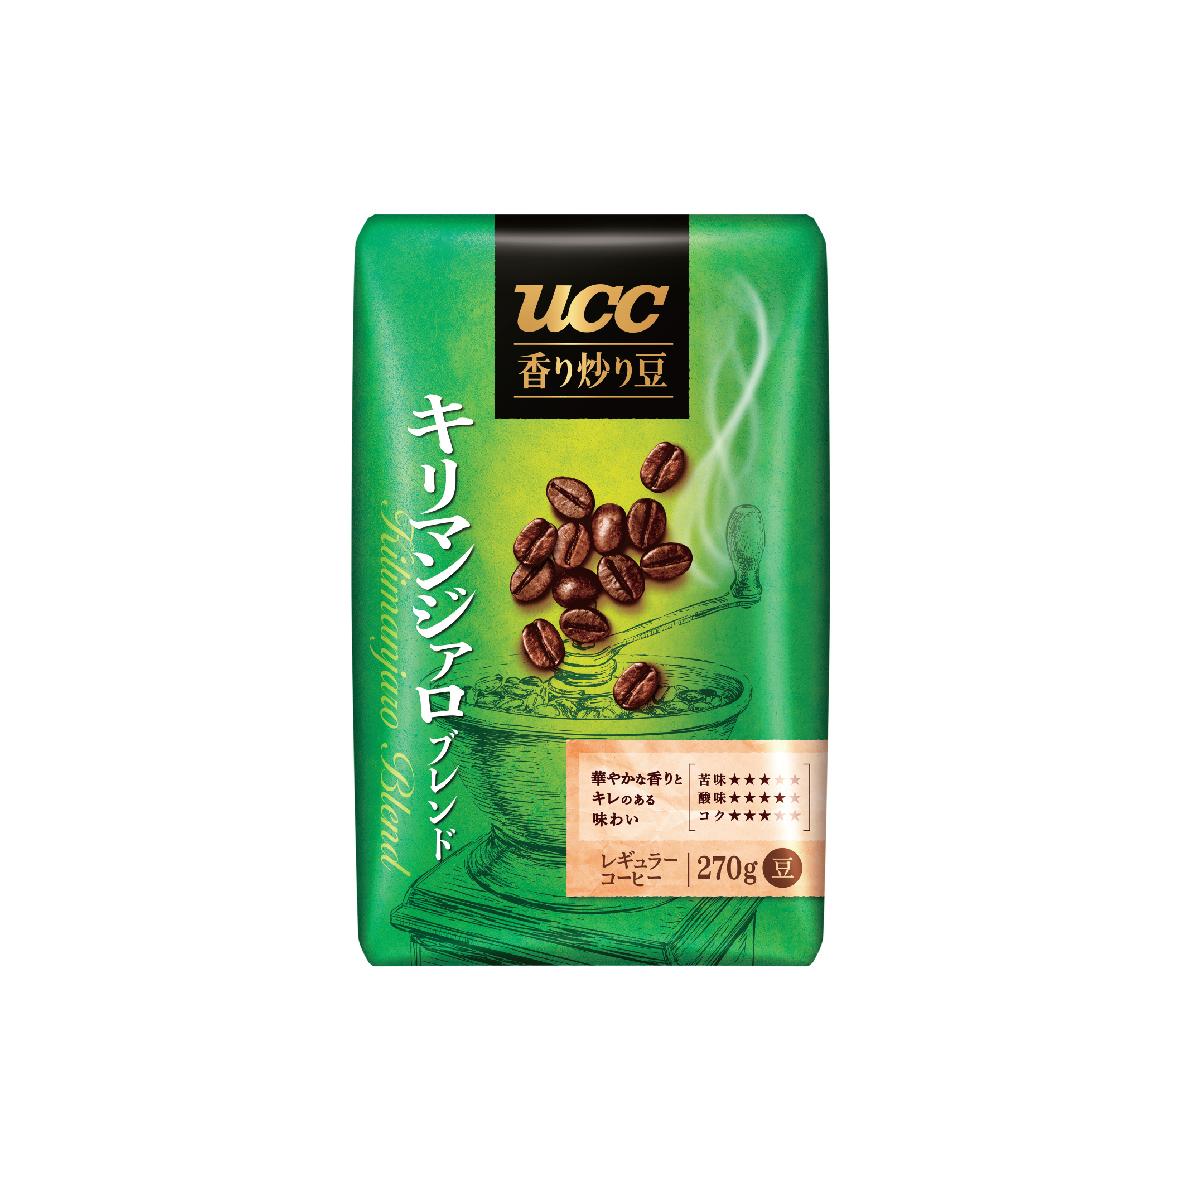 UCC Kilimanjaro Blend Roasted Coffee Beans